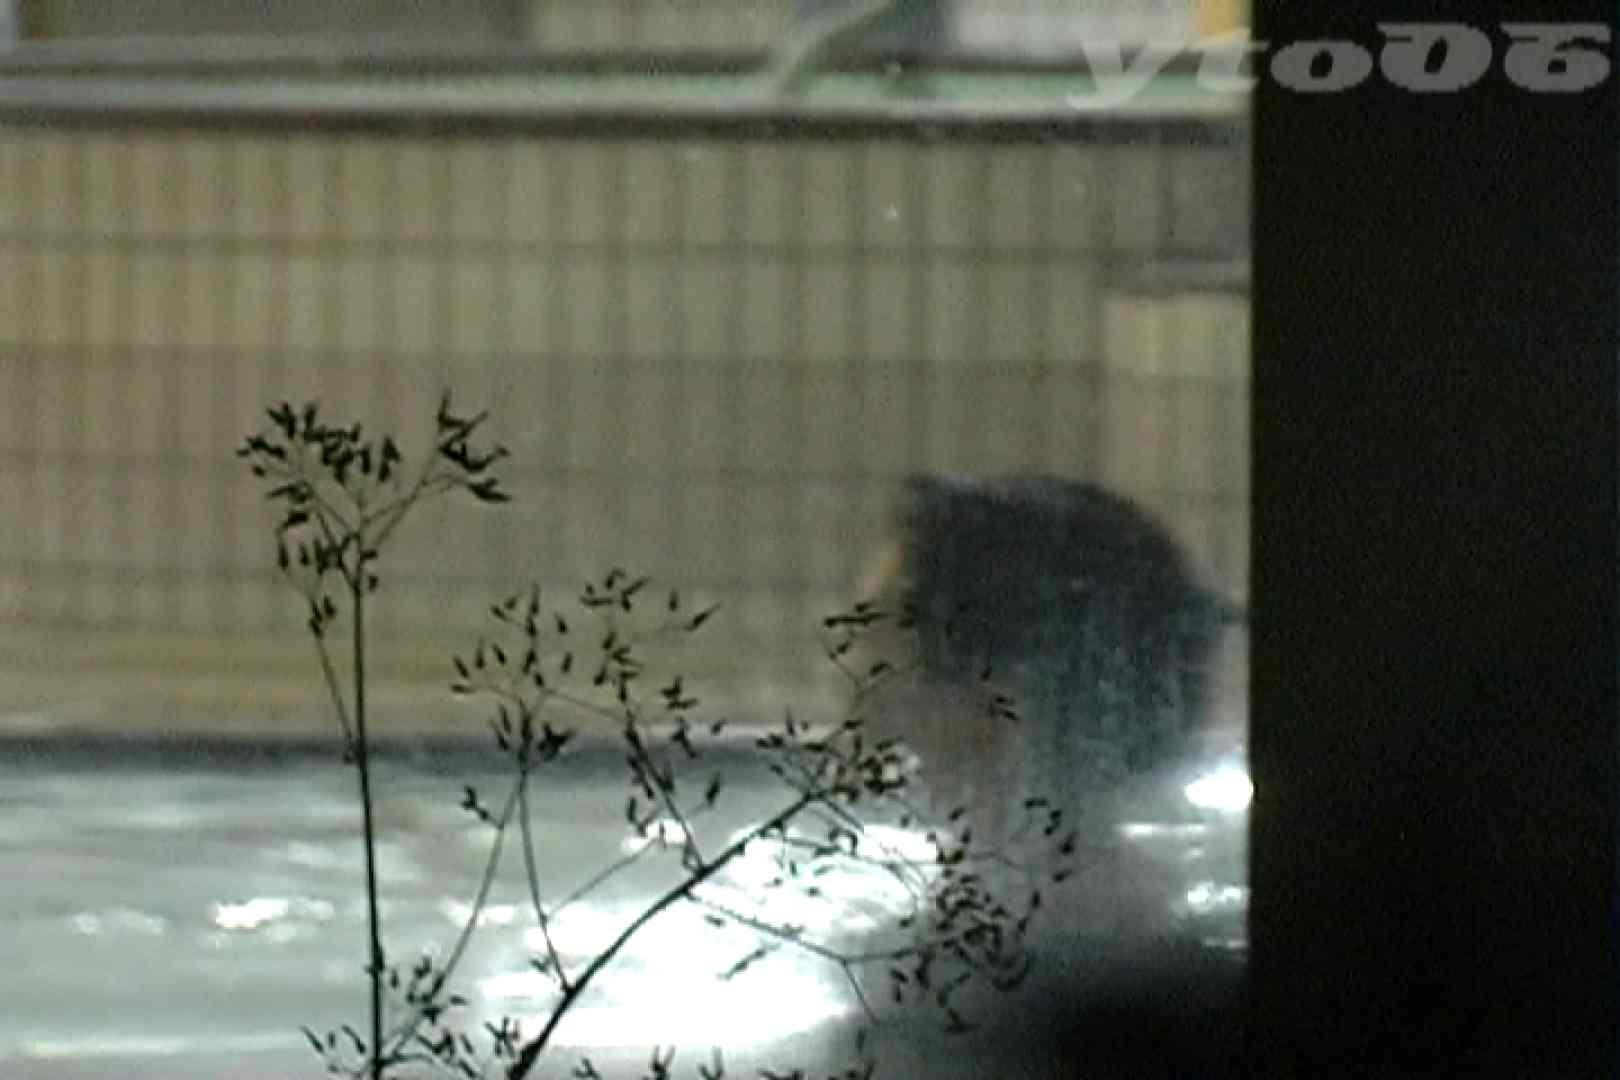 ▲復活限定▲合宿ホテル女風呂盗撮 Vol.34 合宿 ワレメ無修正動画無料 107枚 31